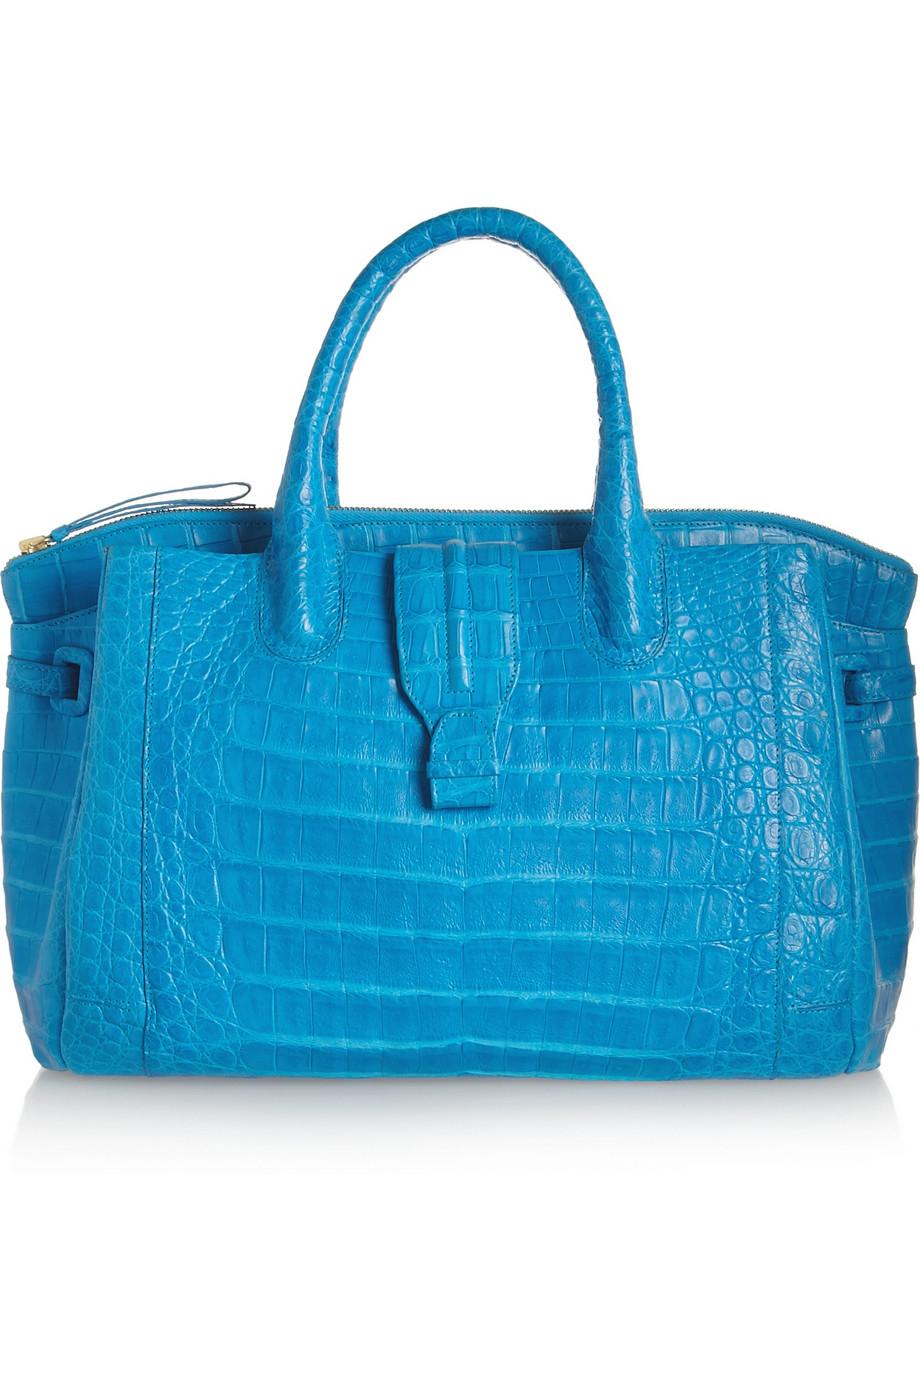 blue crocodile prada pocketbook